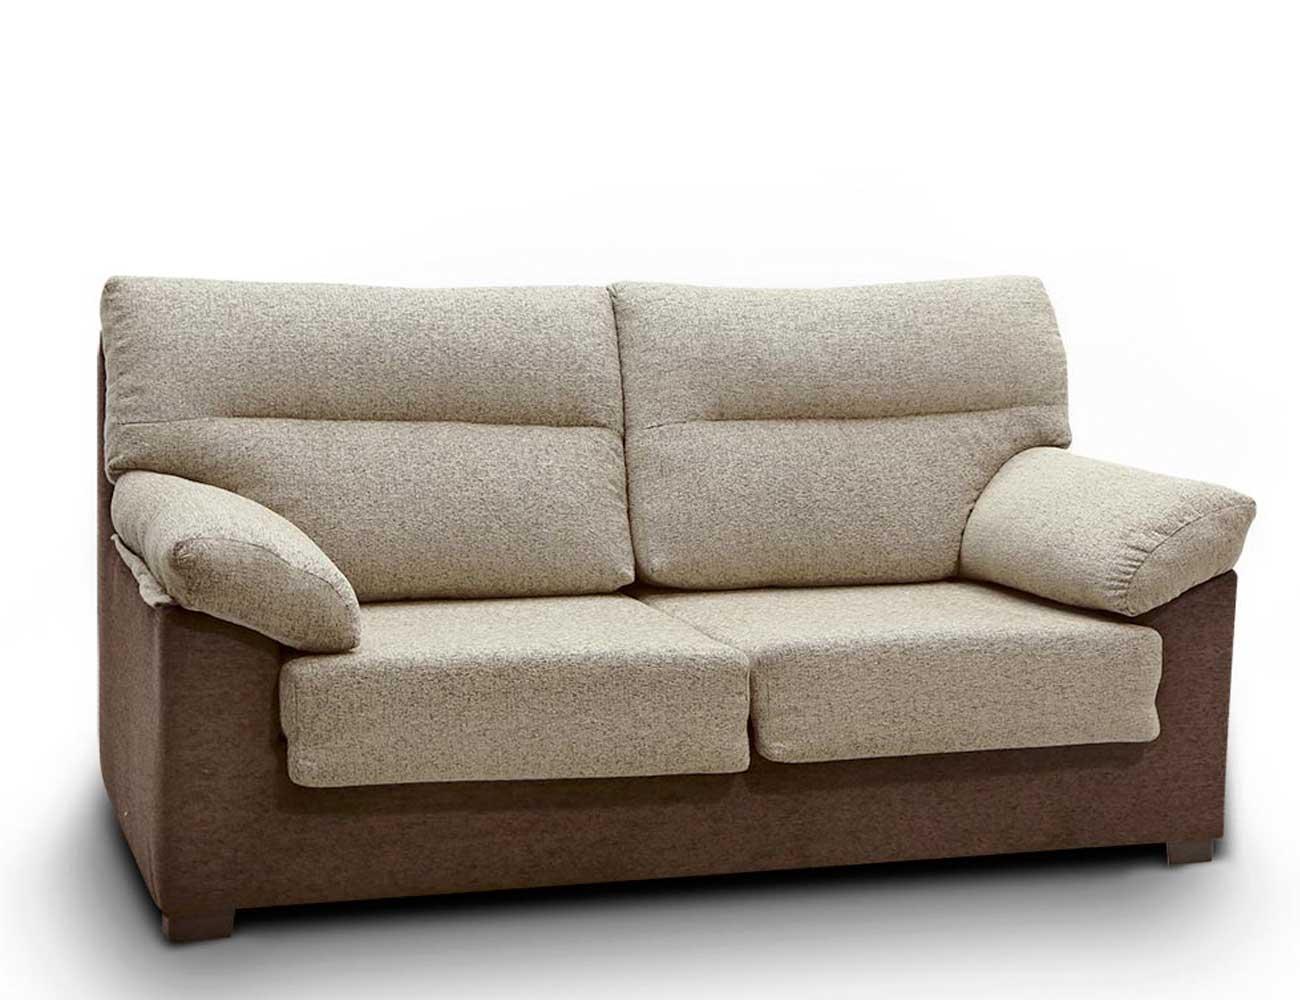 Sofa 3 plazas barato5